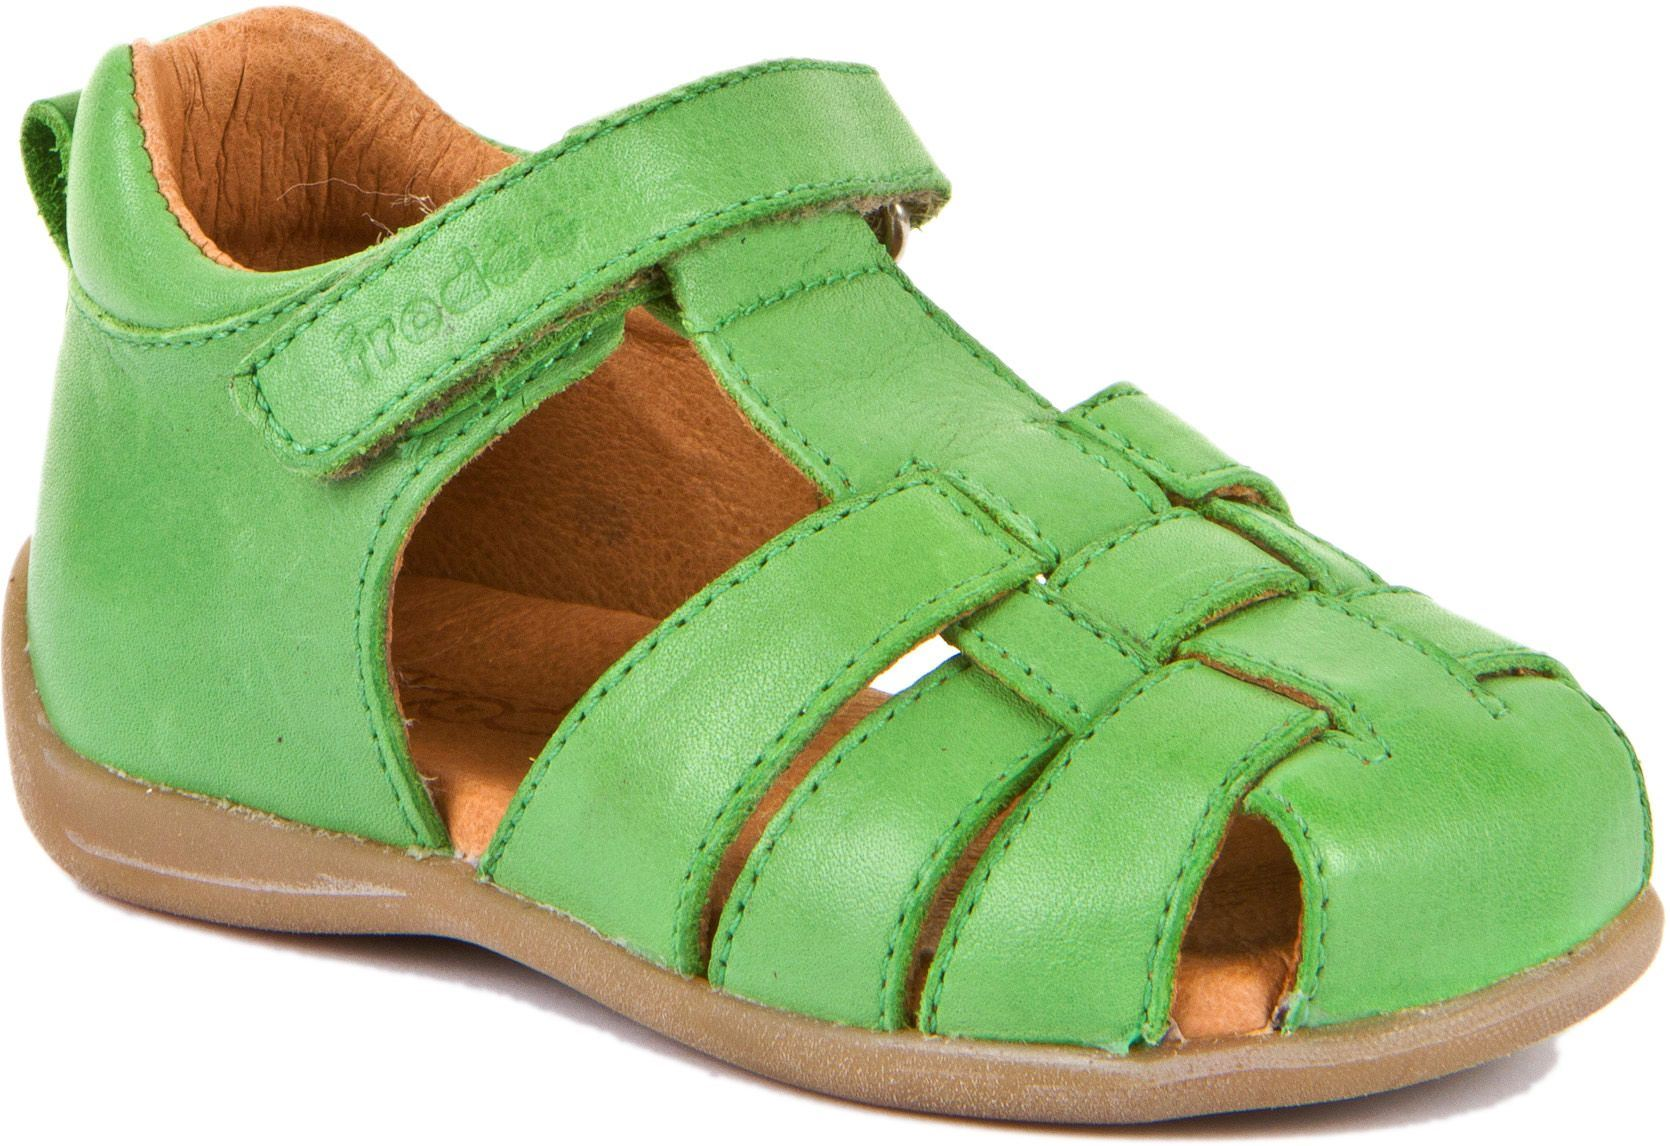 Froddo Lauflerner Sandale Grün